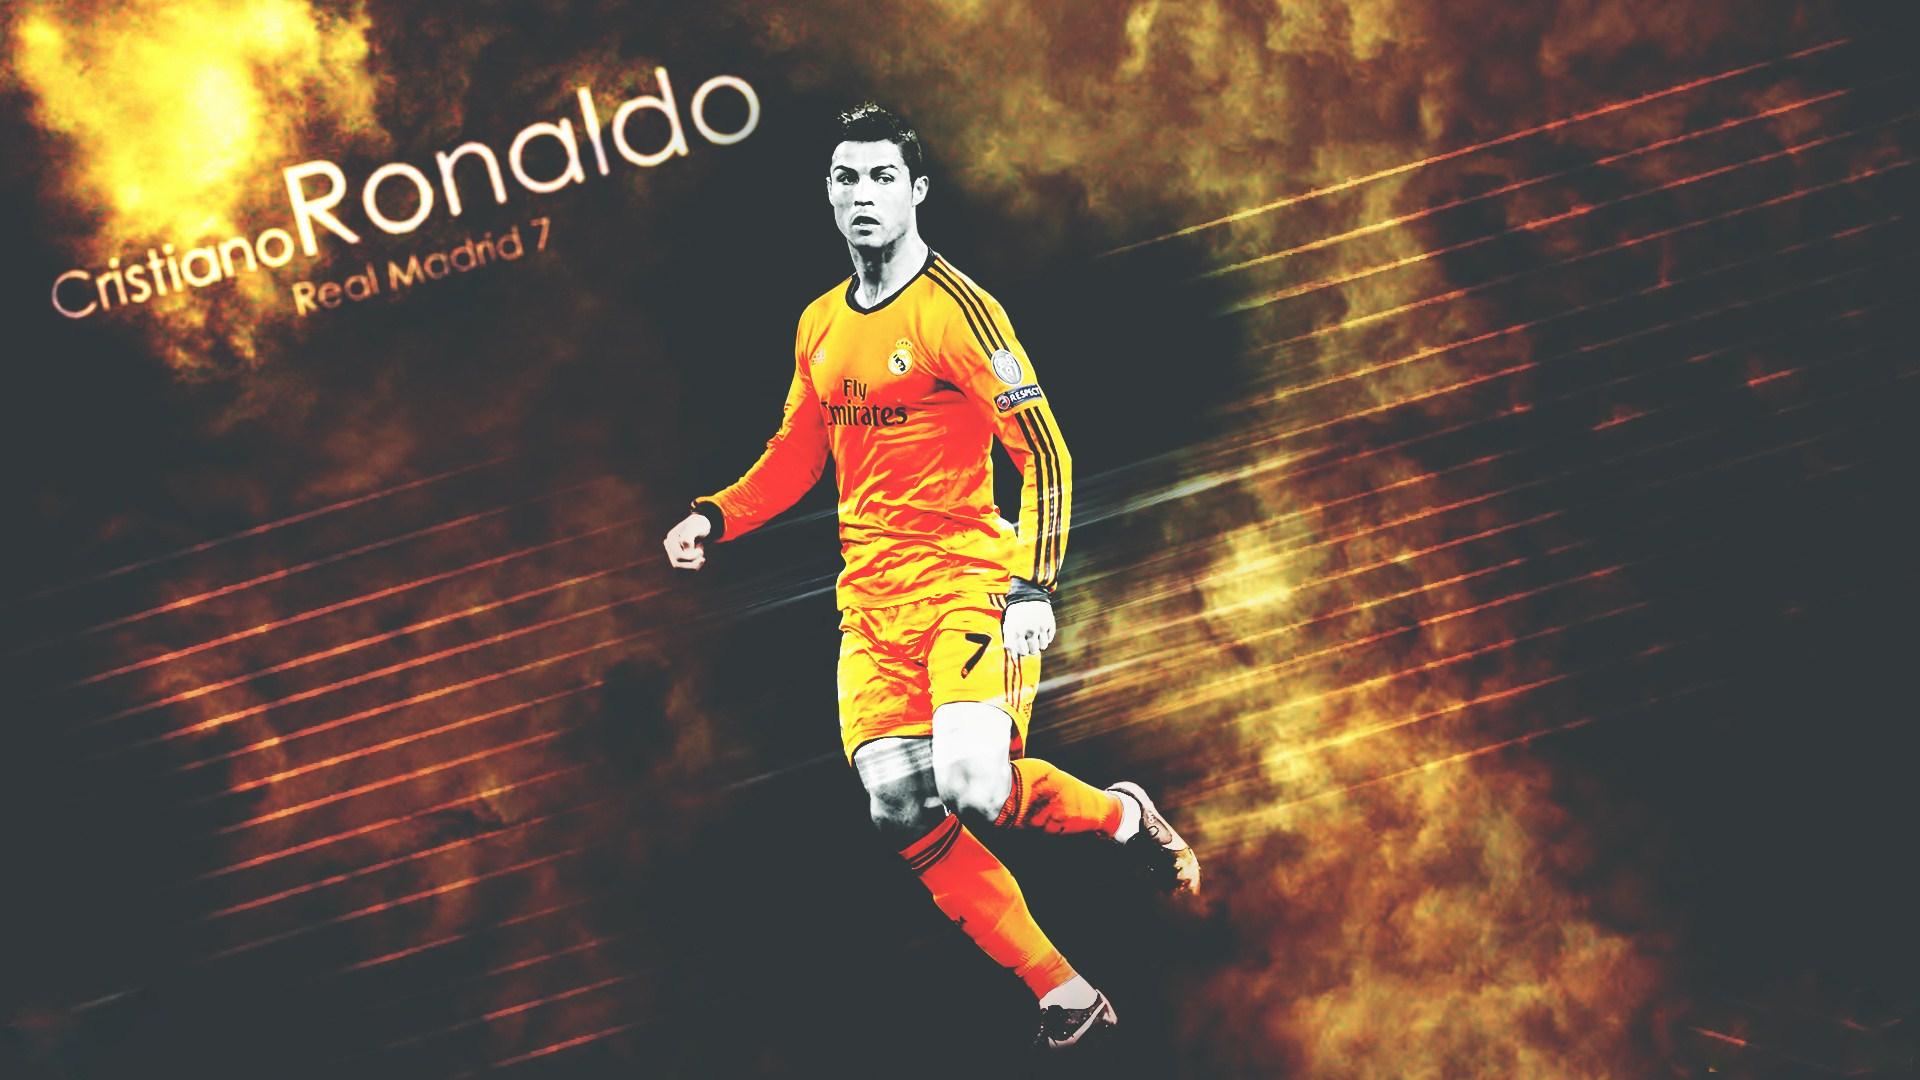 Cristiano ronaldo full hd wallpaper and background image sports cristiano ronaldo real madrid cf wallpaper voltagebd Image collections